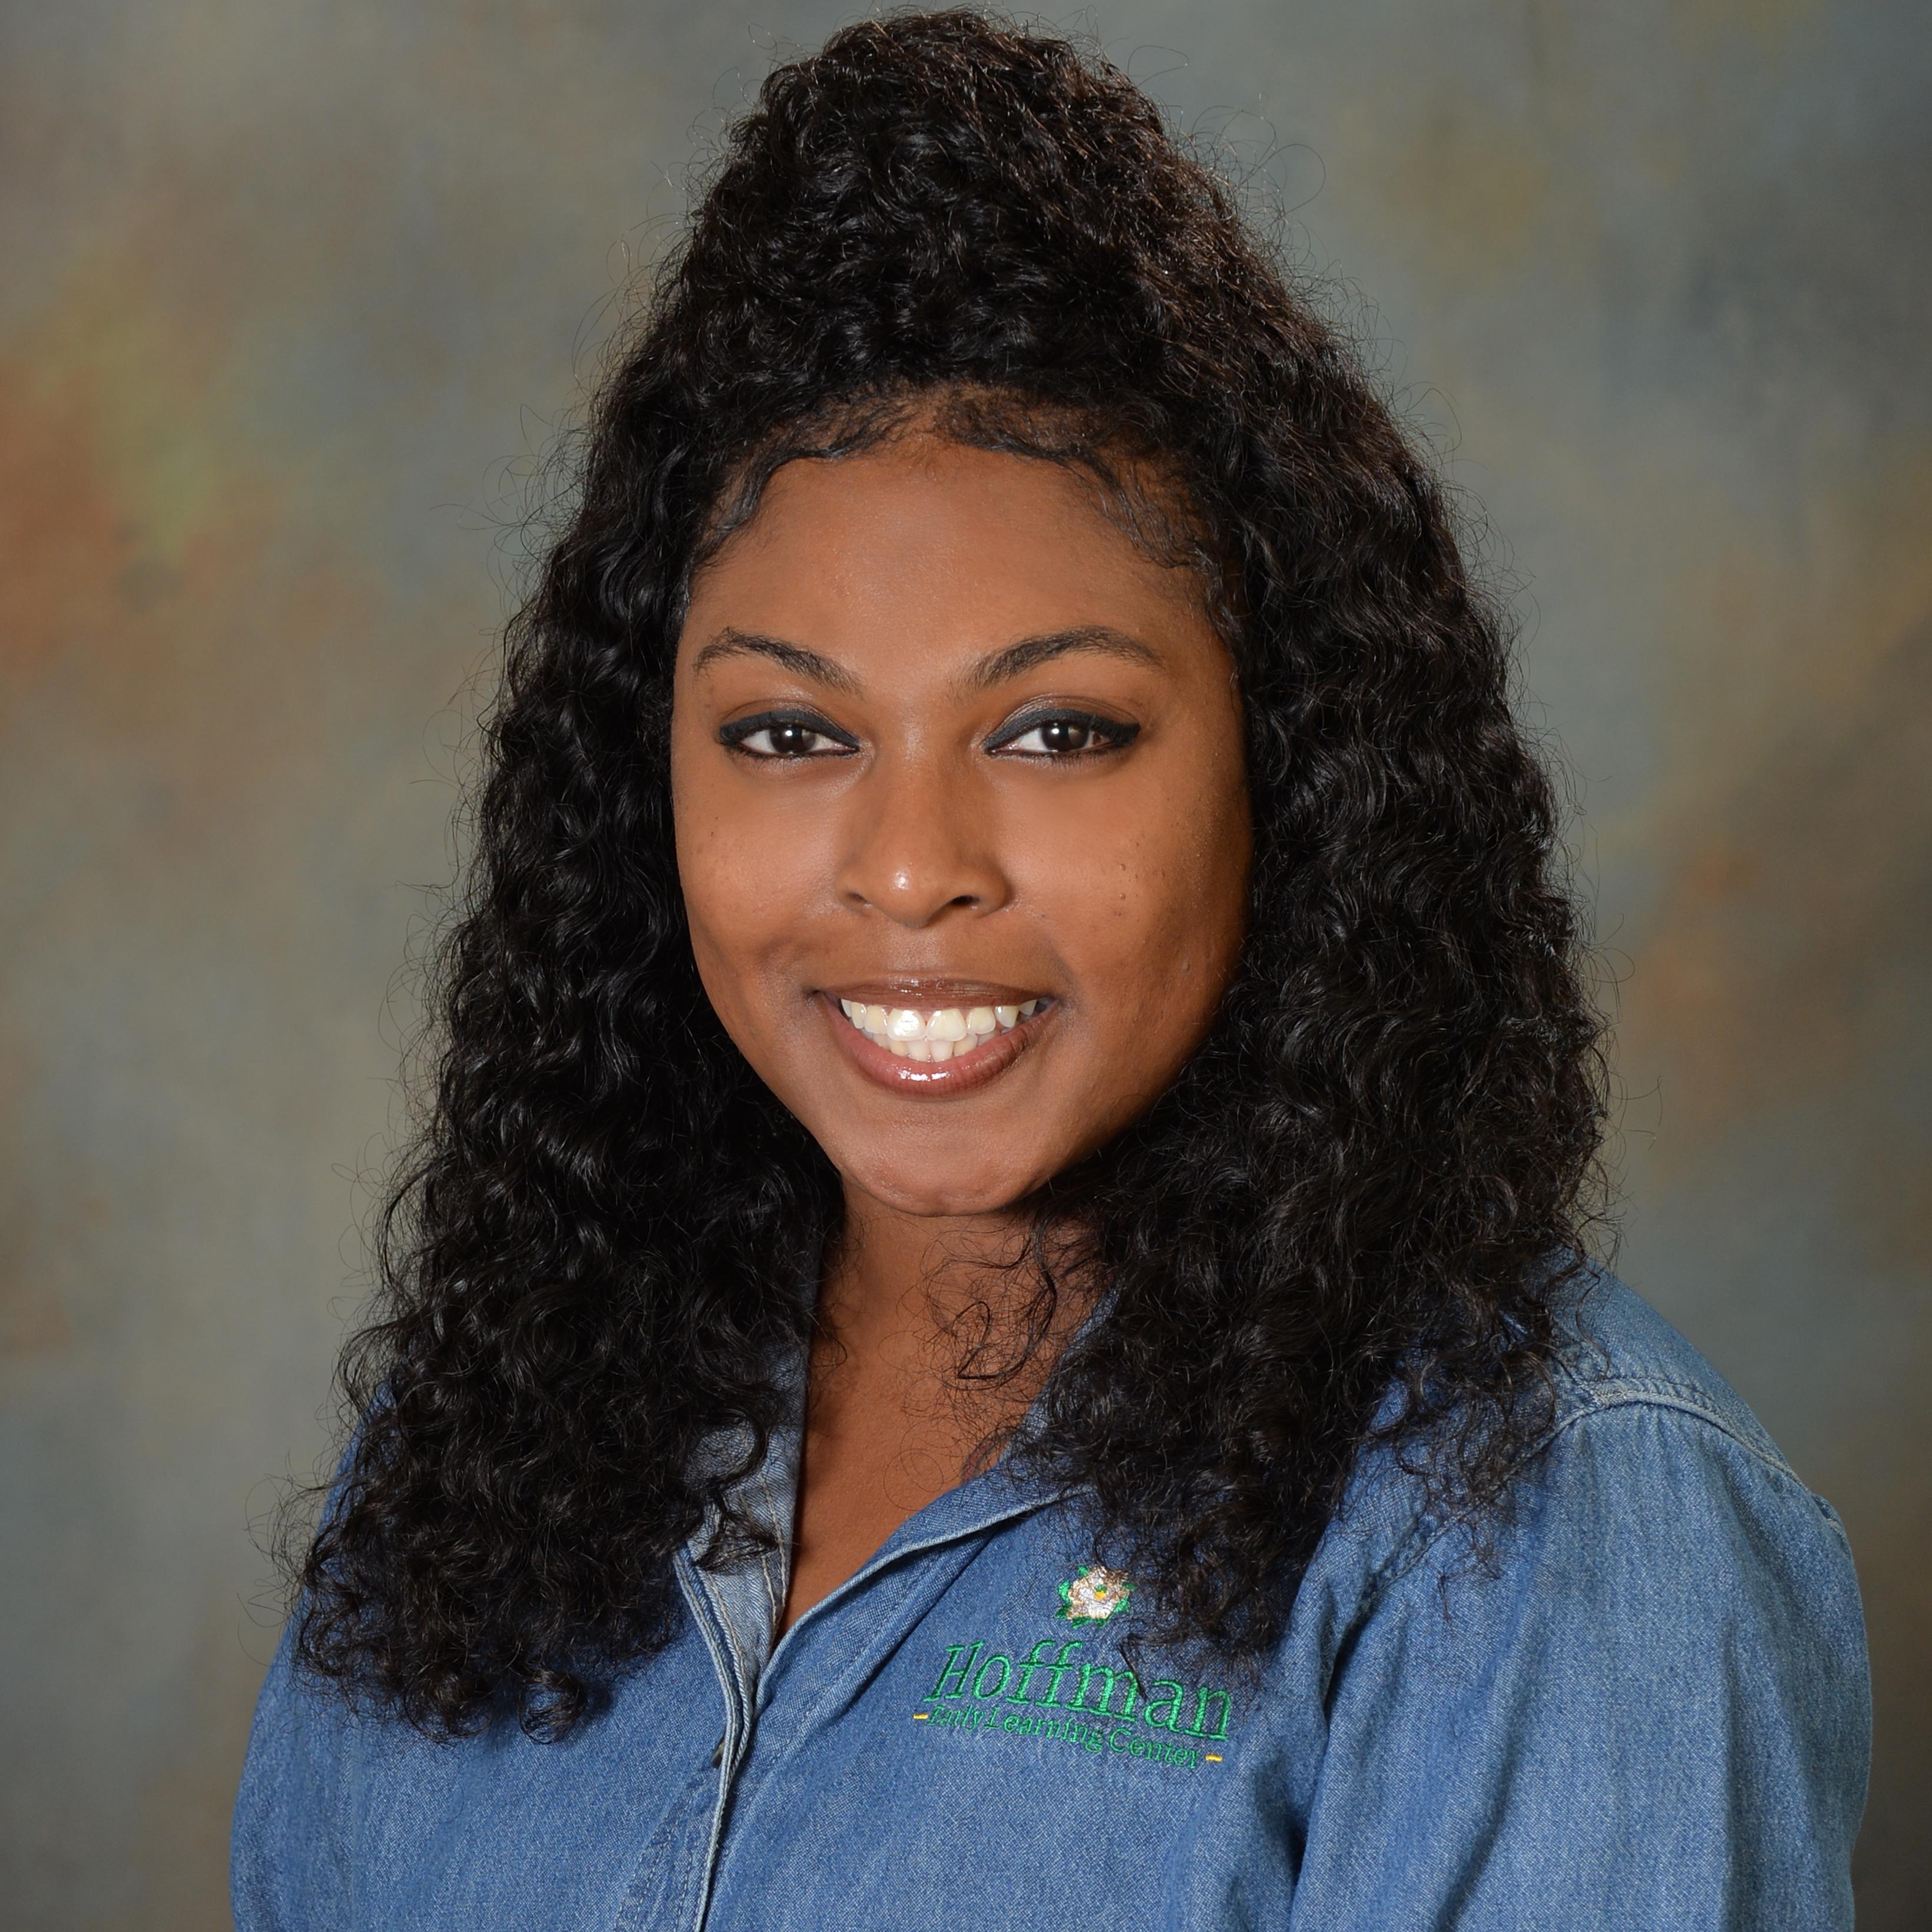 Klinesha Bibbins's Profile Photo